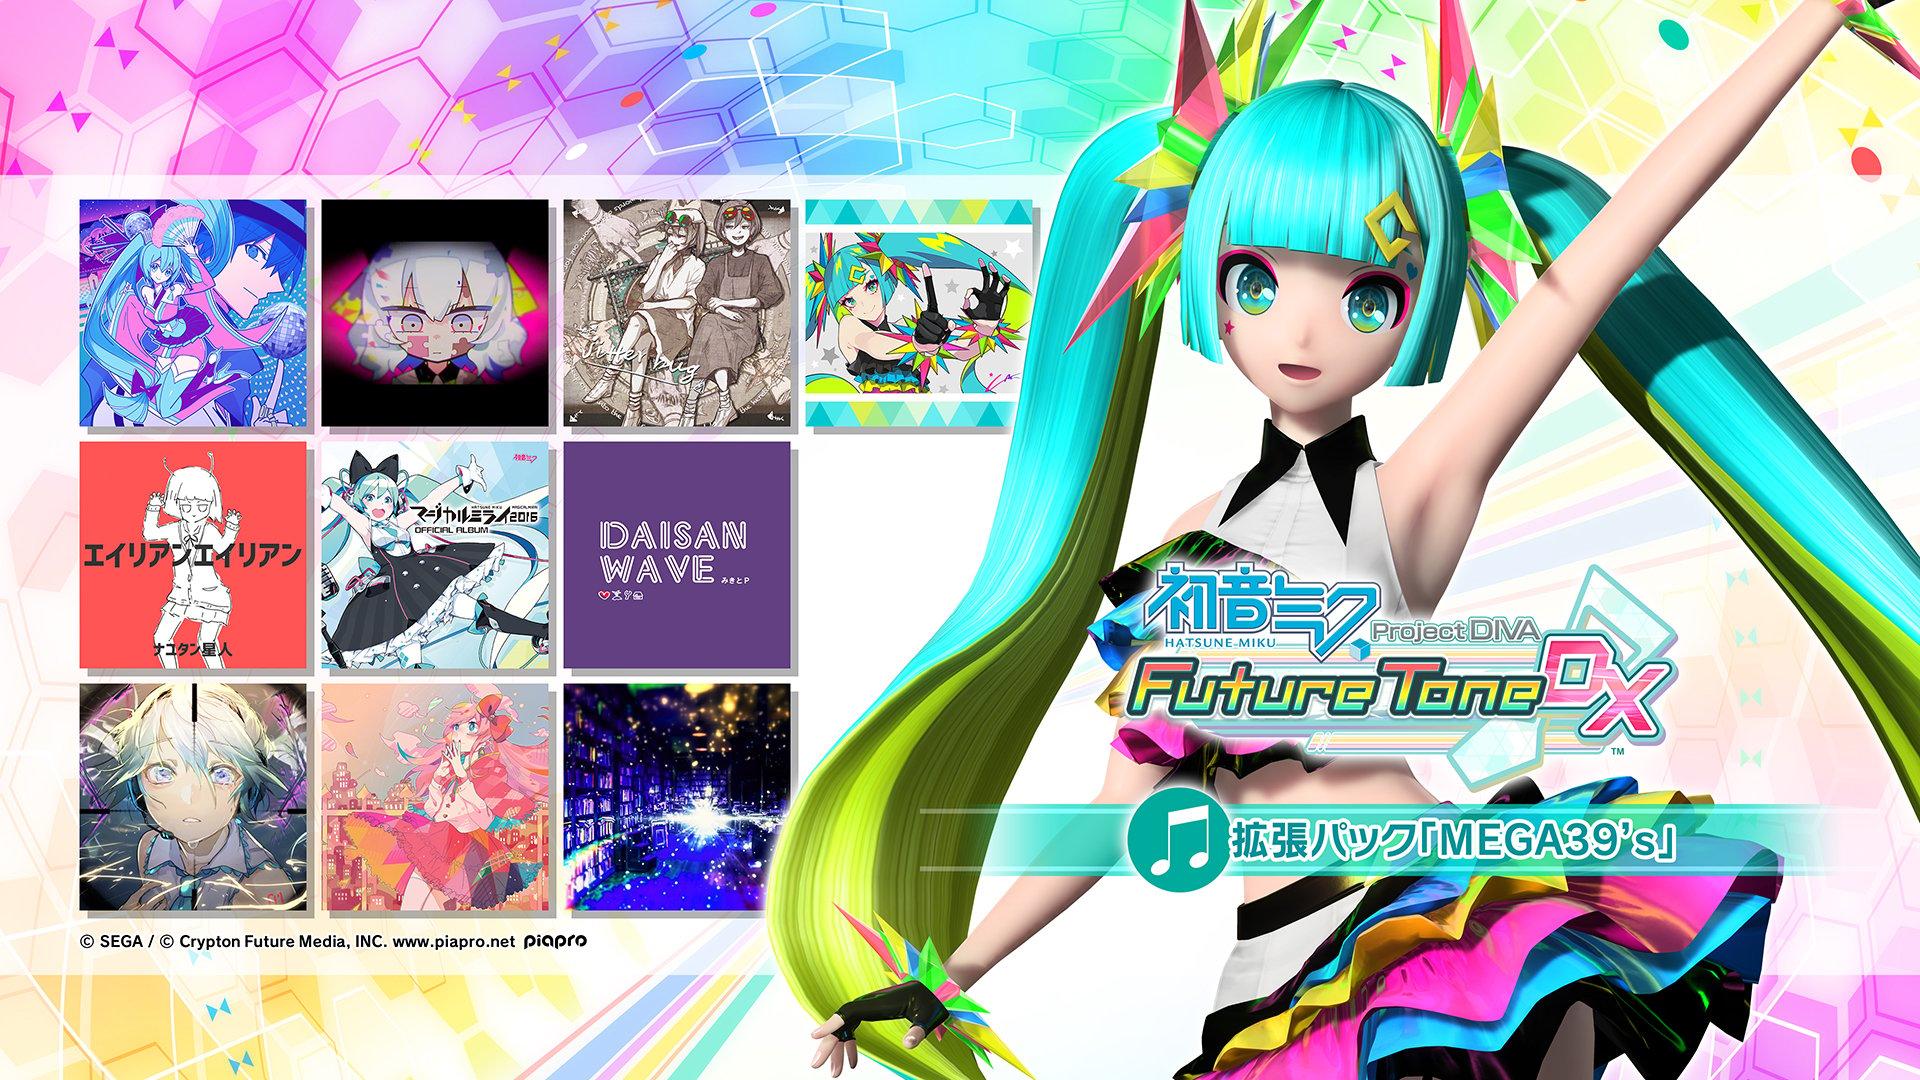 Hatsune Miku Project Diva Future Tone Dlc Mega Mix Expansion Pack Launches July 2 In Japan Update Gematsu